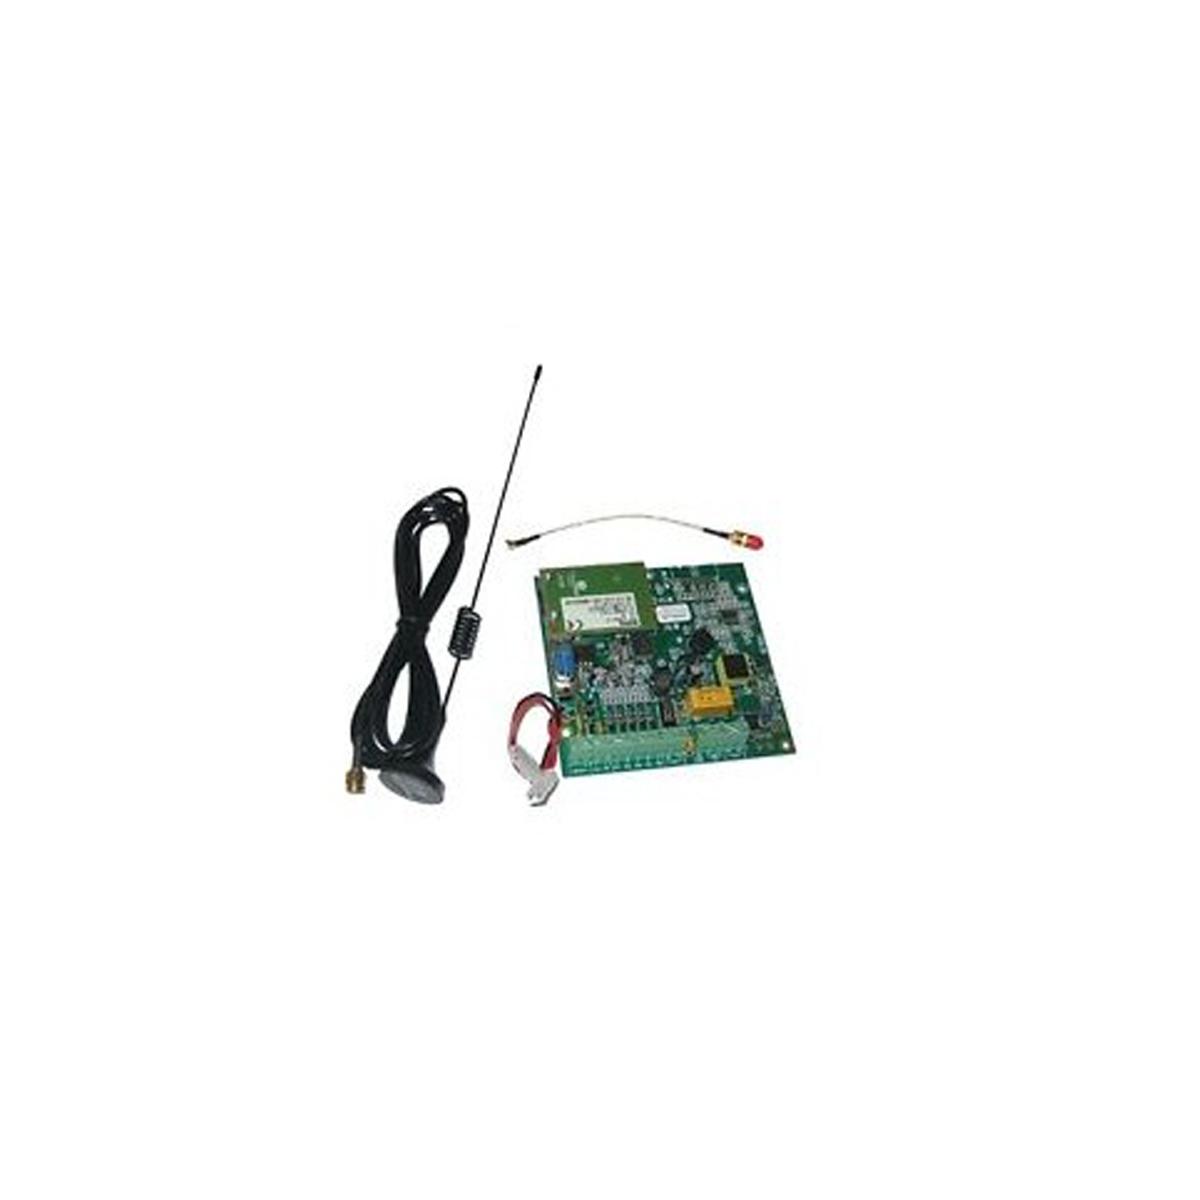 Transmissor GSM/GPRS Sem Caixa INIM